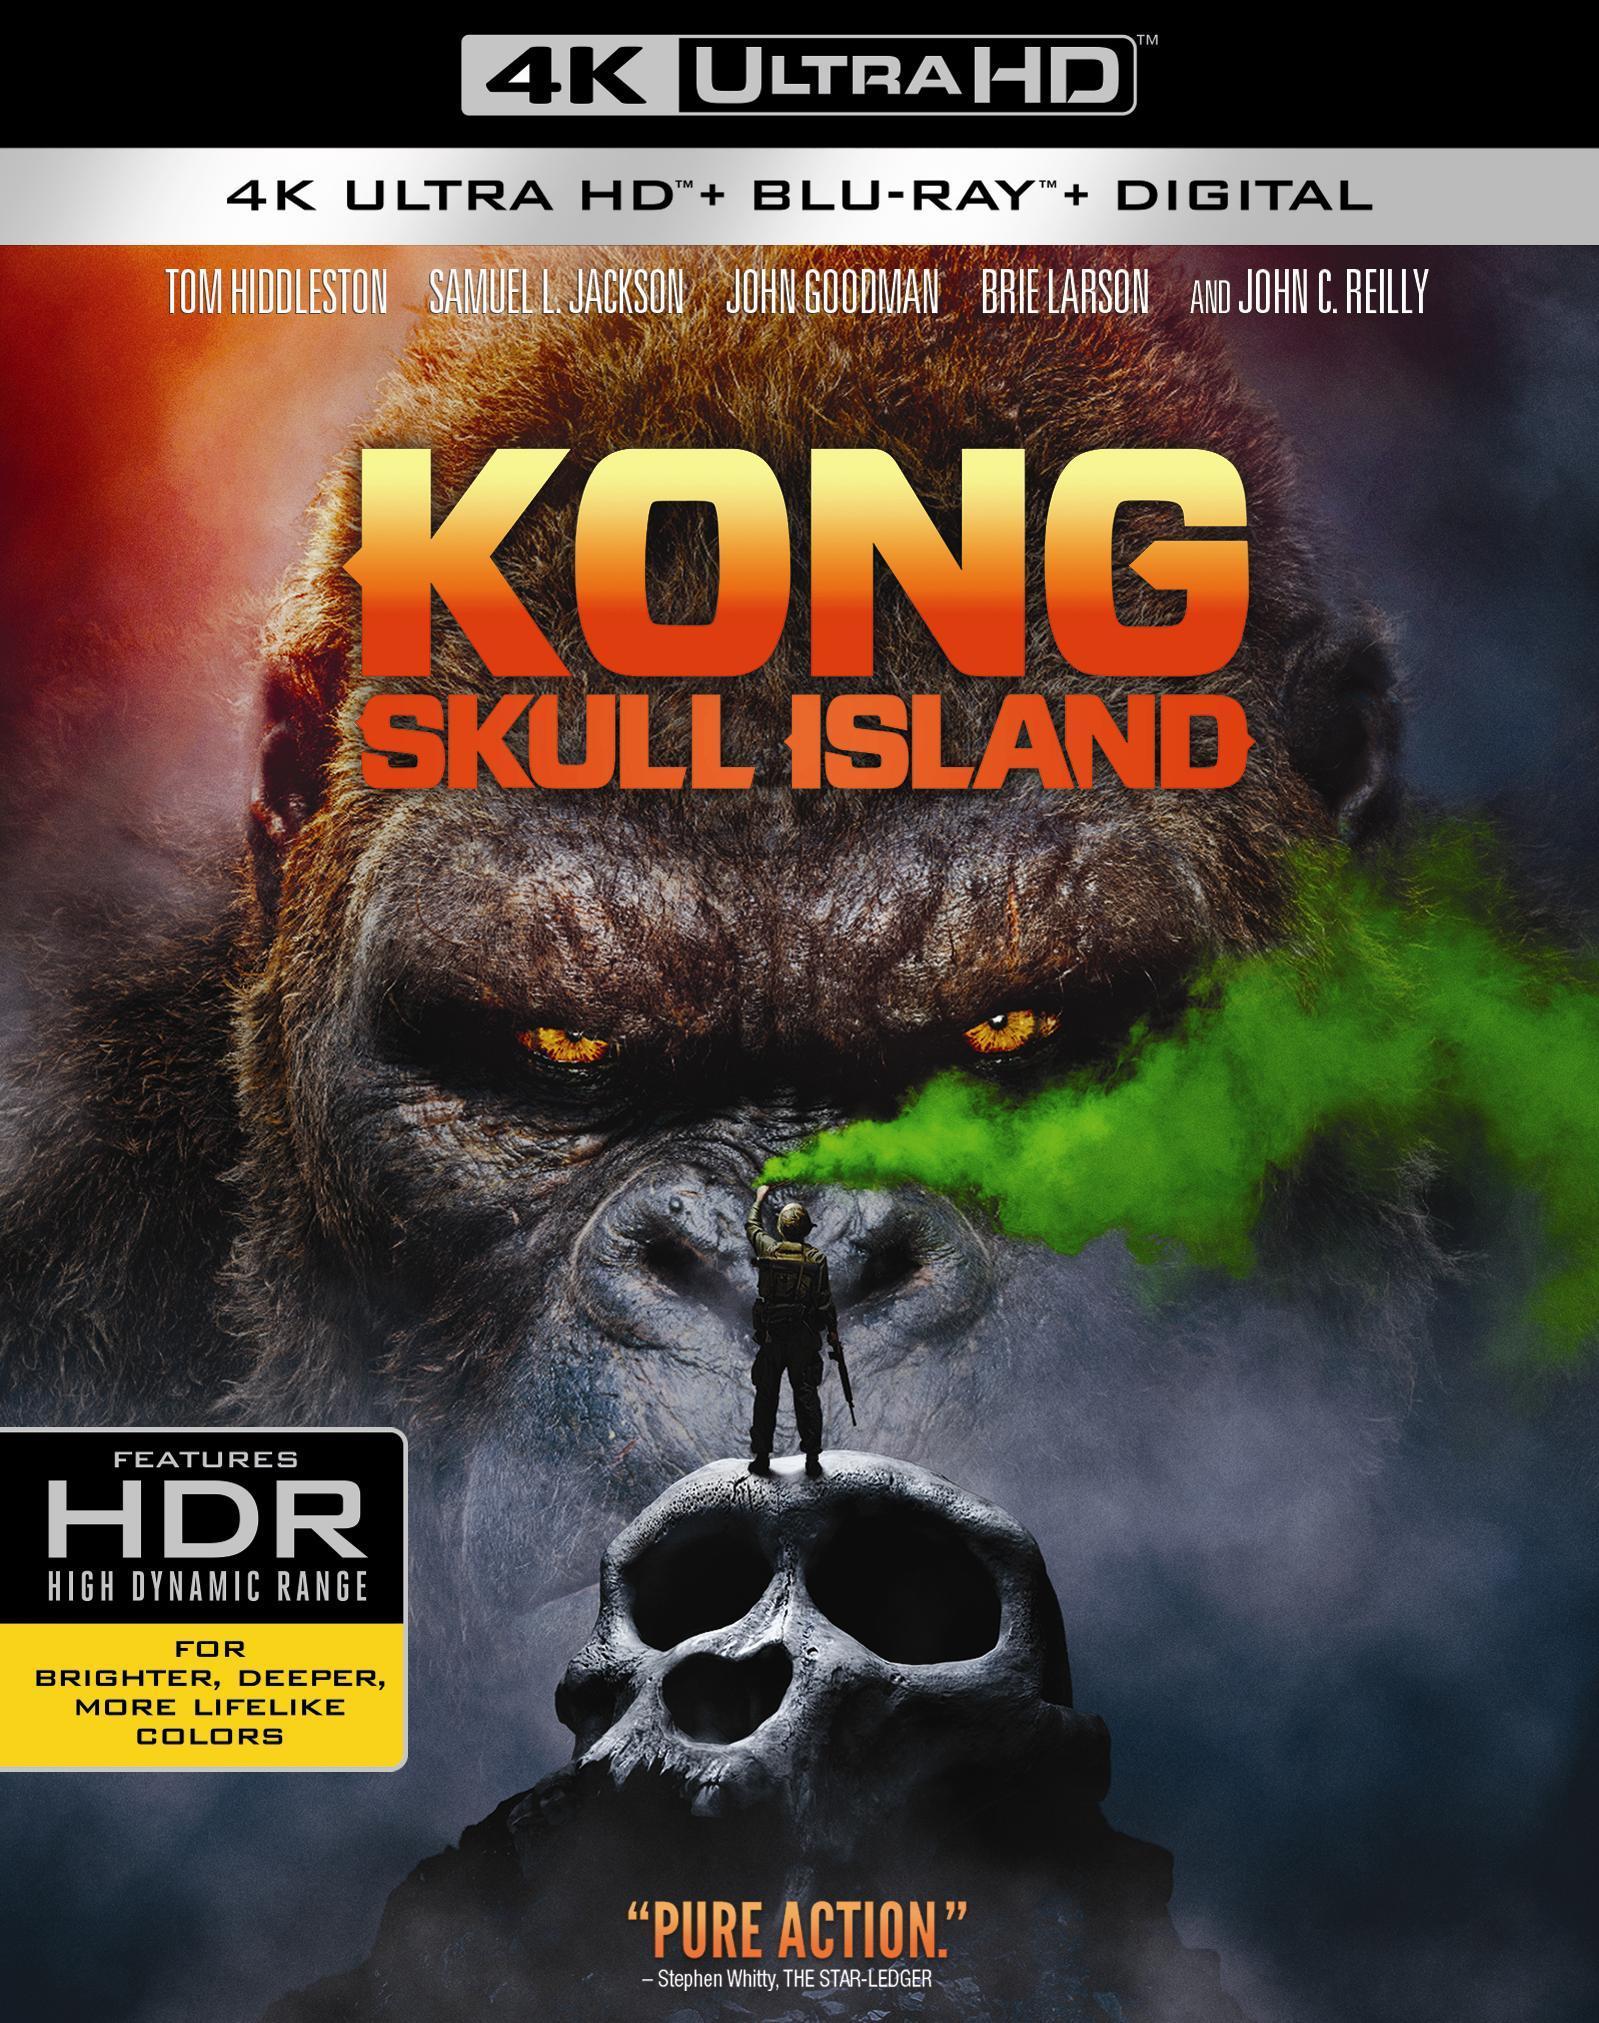 Kong: Skull Island 4K (2017) UHD Ultra HD Blu-ray